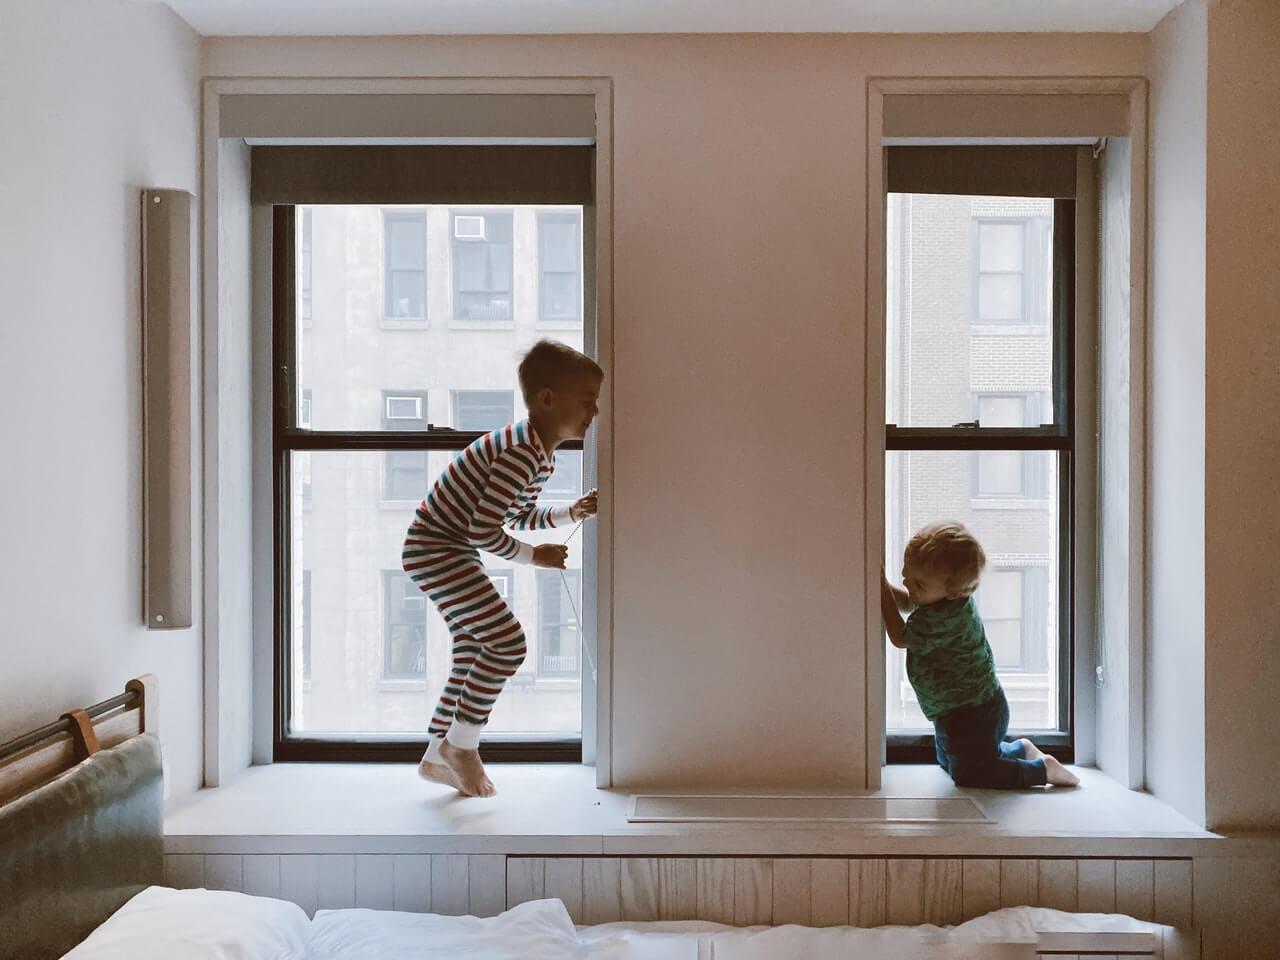 ventanas eficientes y aisladas térmicamente